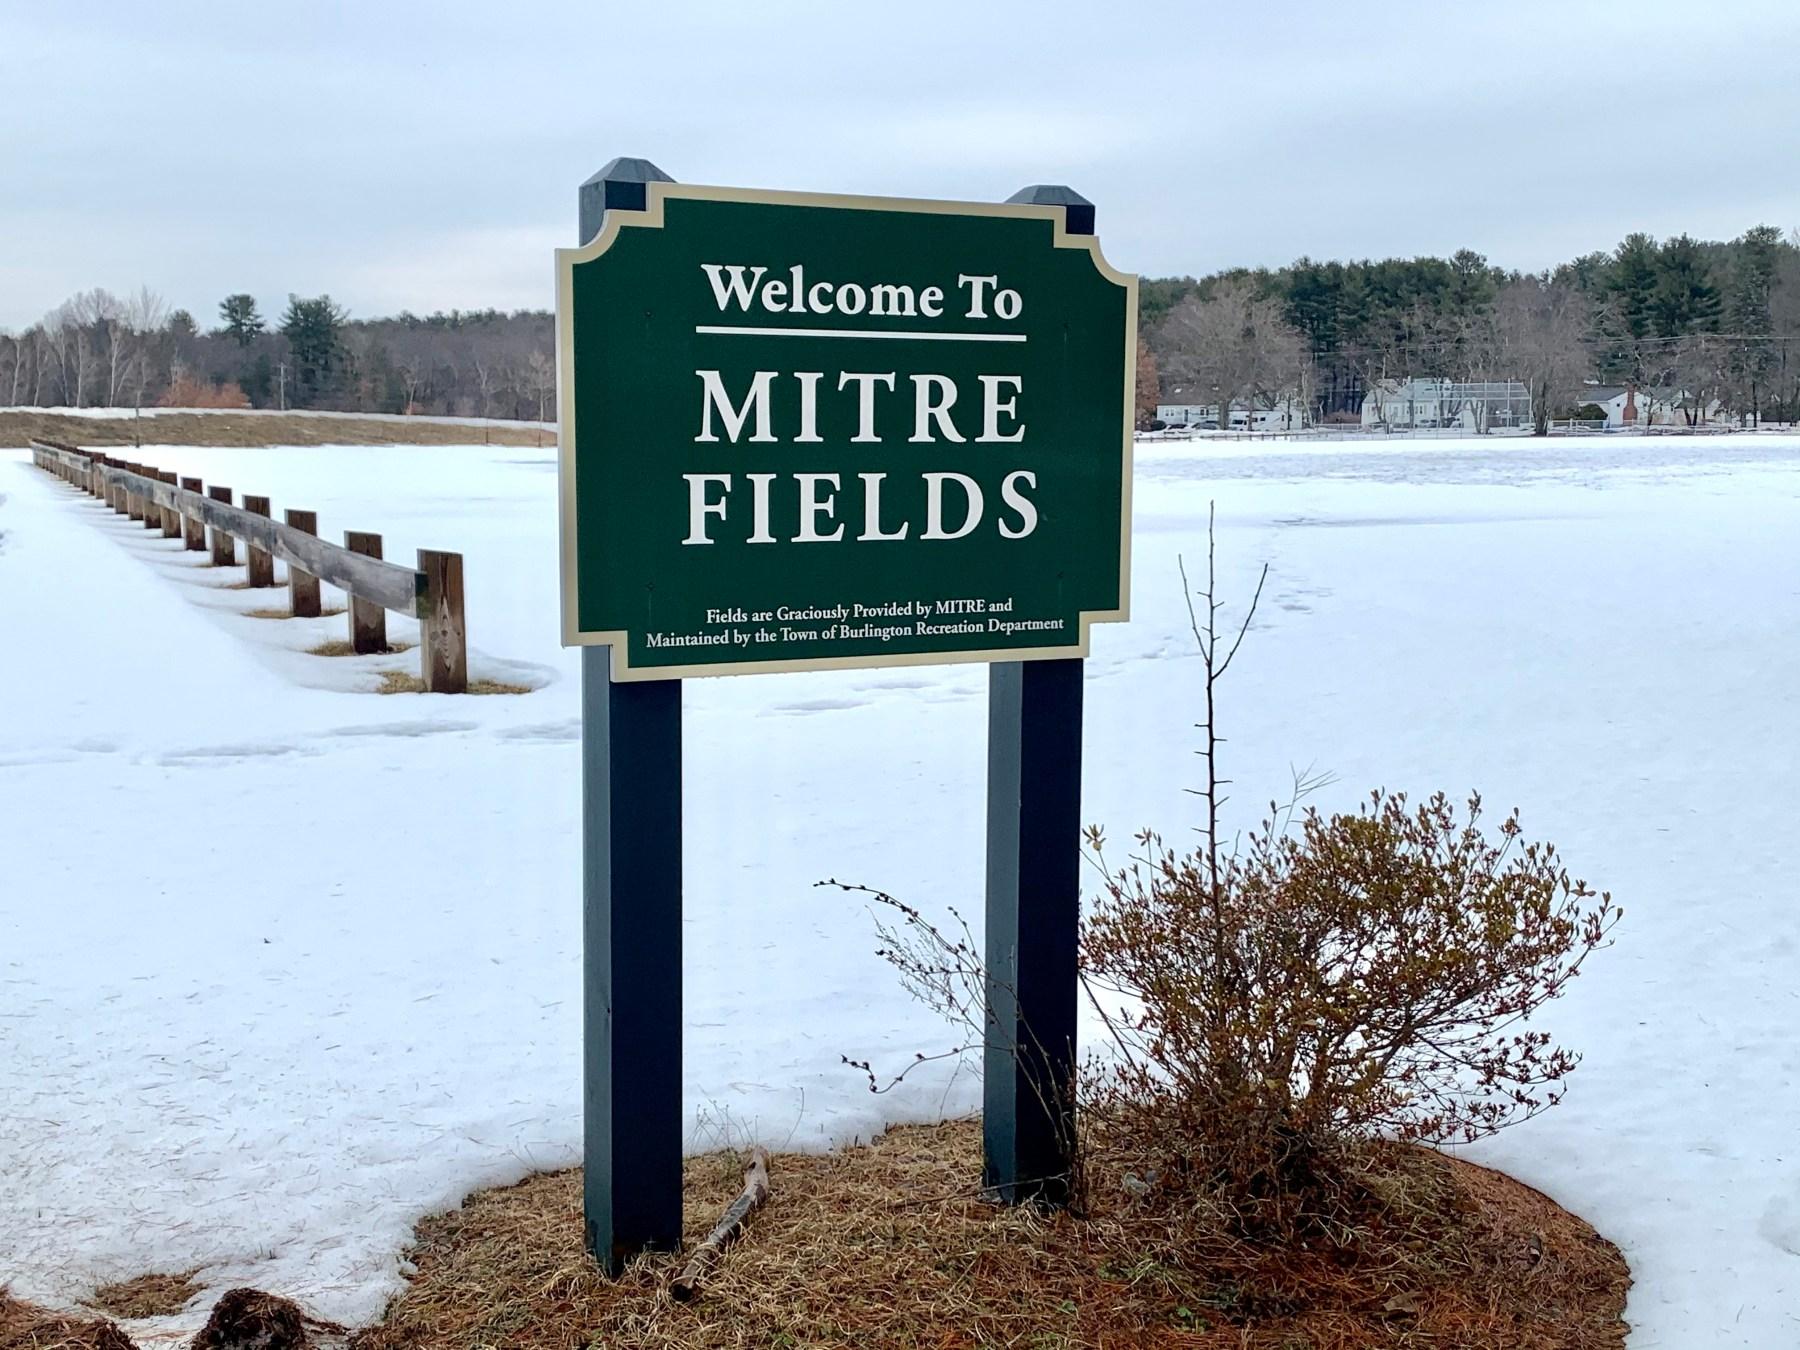 Mitre Fields sign, Burlington MA